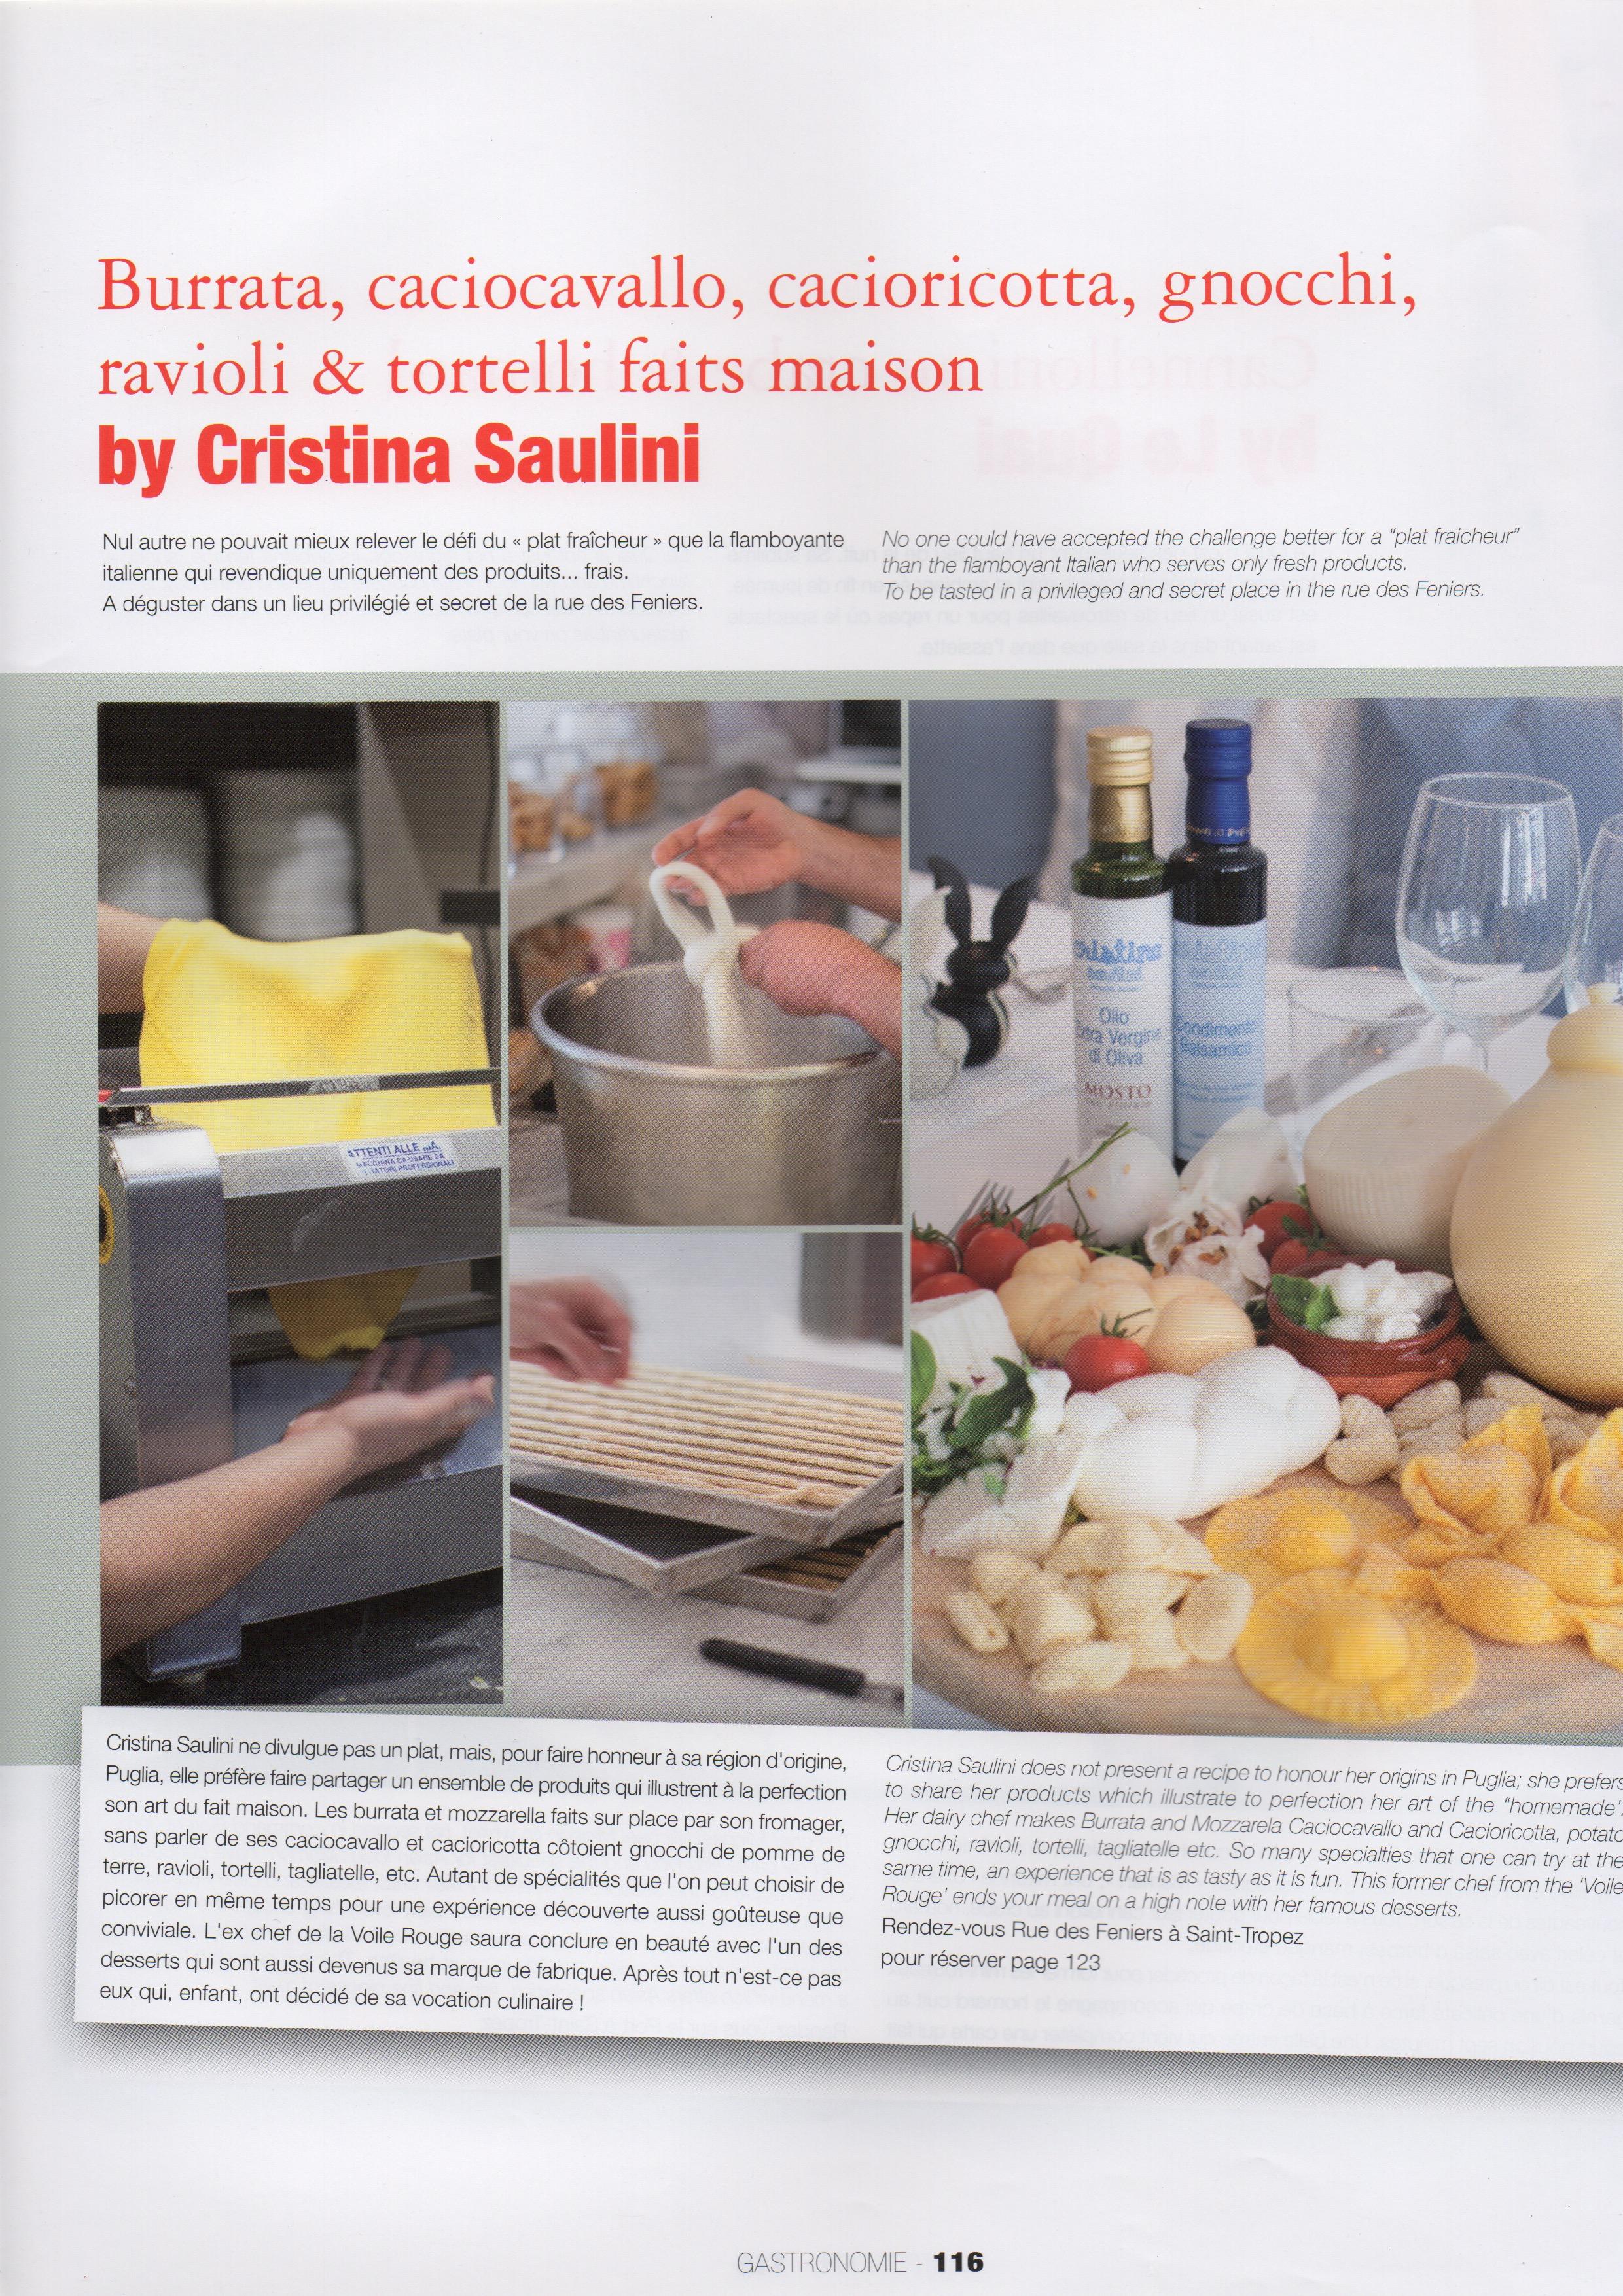 série de photos culinaires faites par Vanessa Romano chez Christina Saulini